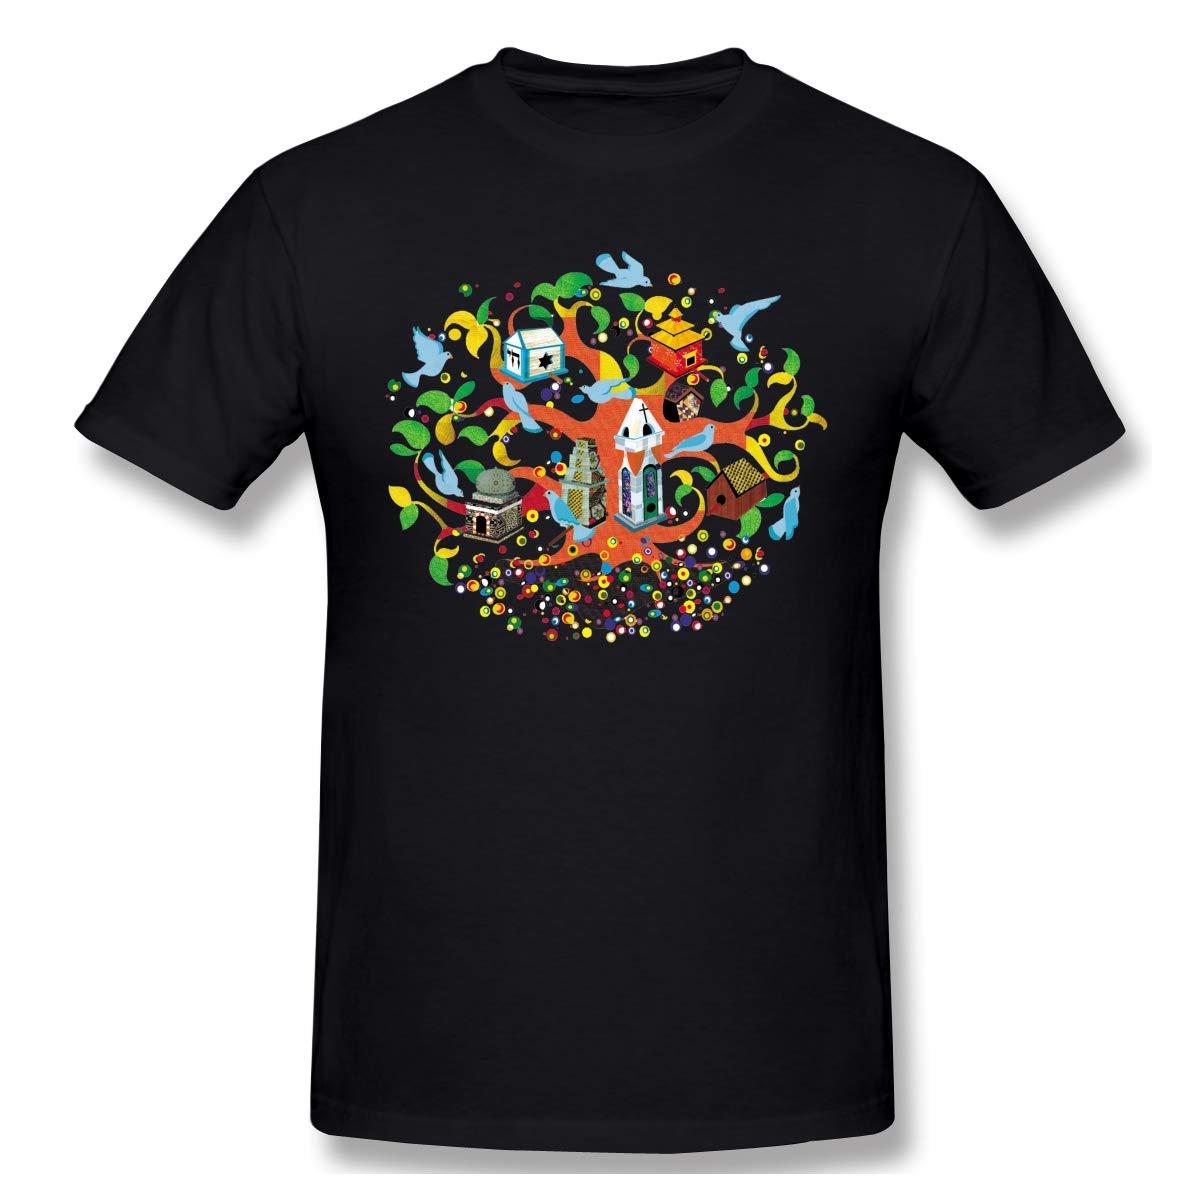 S Breadalbane Academy Fashion Black Shirt